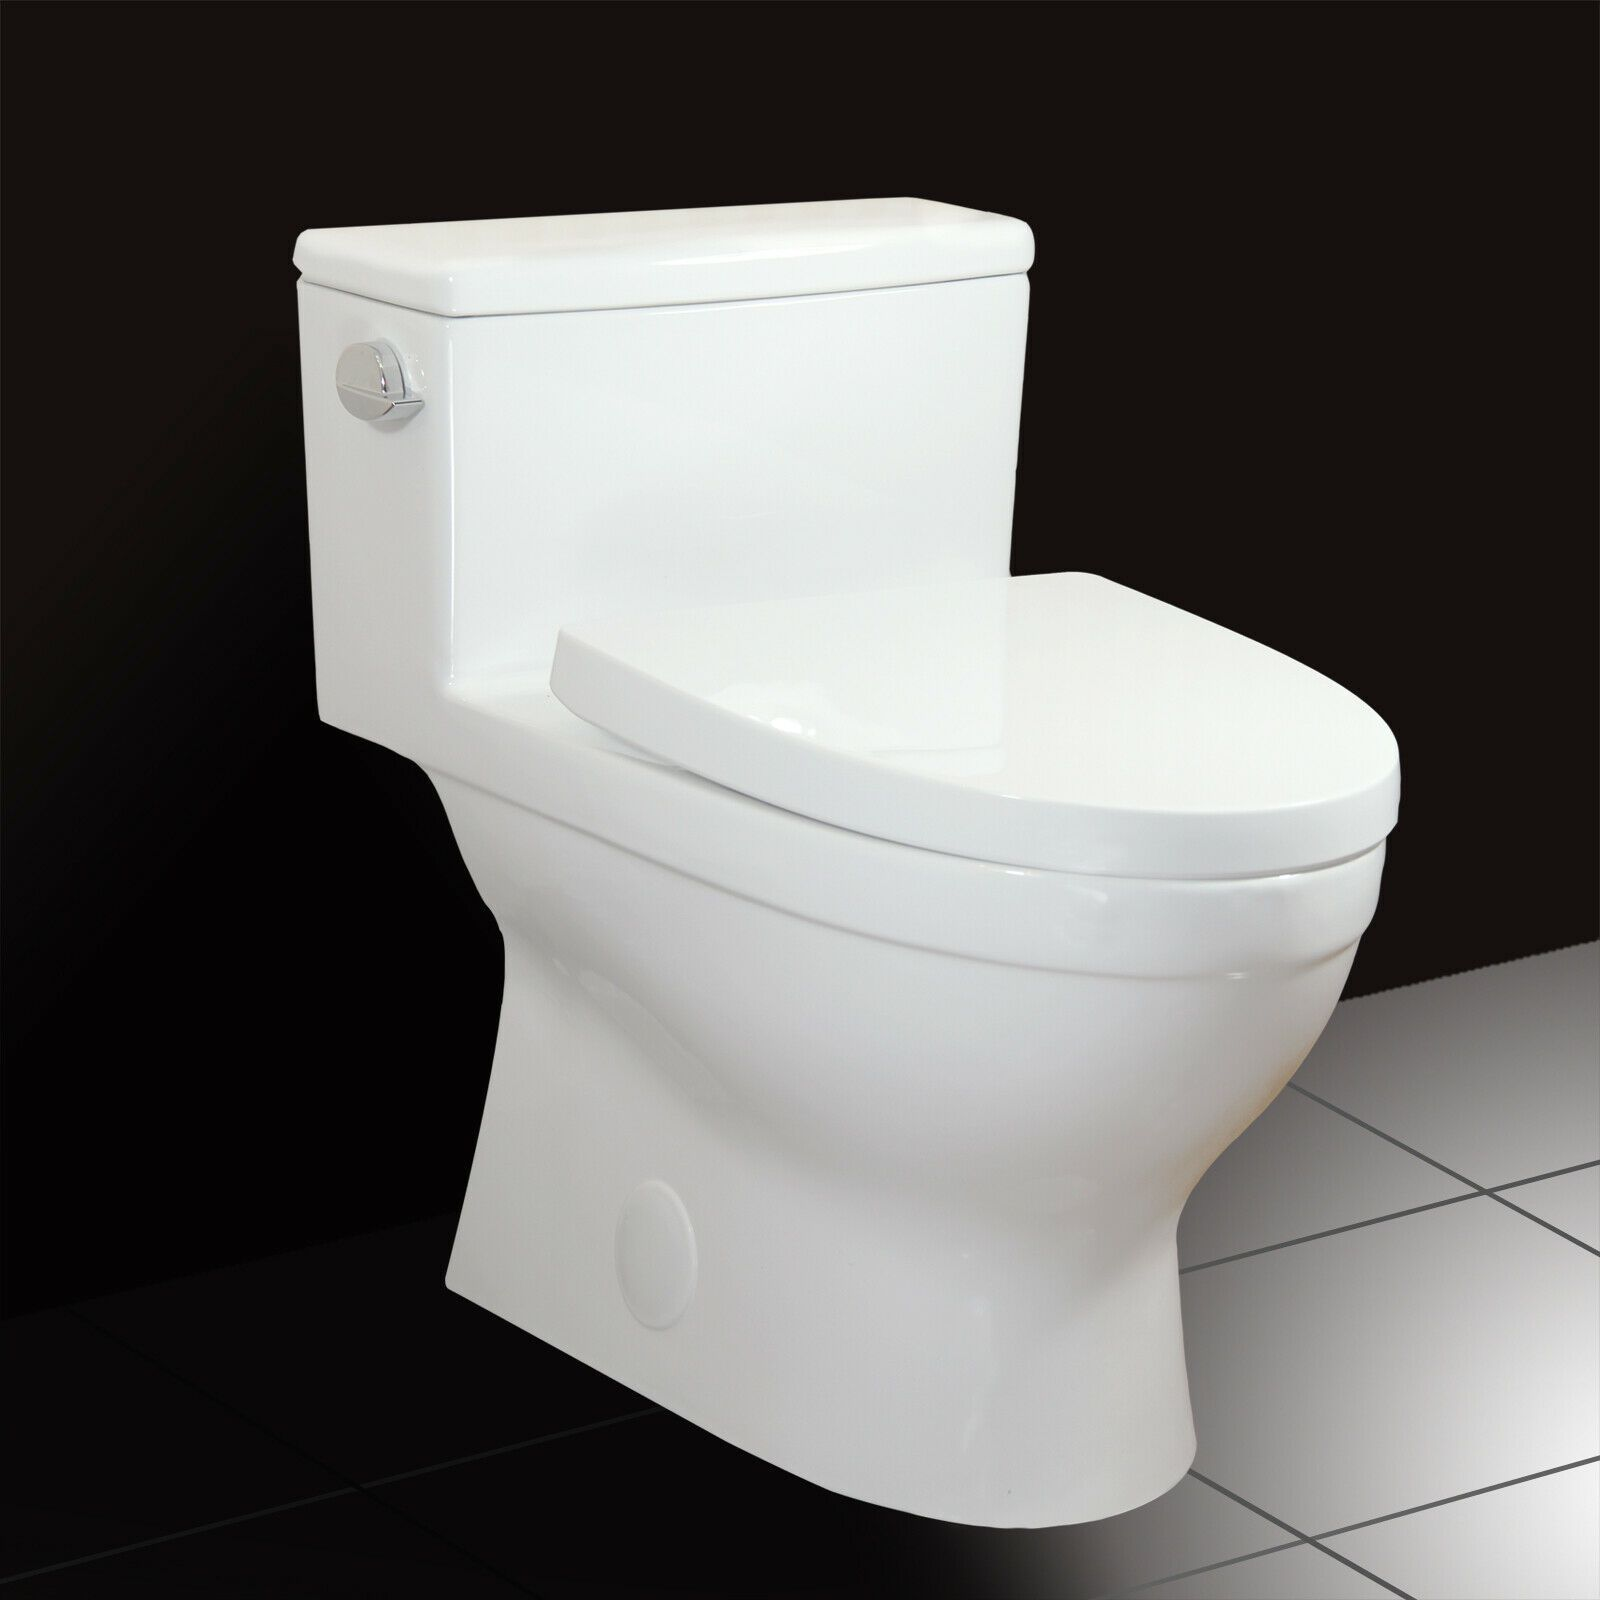 Winzo Elongated One Piece Toilet Powerful Flush 1 28 Gpf Watersense Cupc White Toilets Ideas Of Toilets Toilets Toilet Home Depot Toilets Toto Toilet